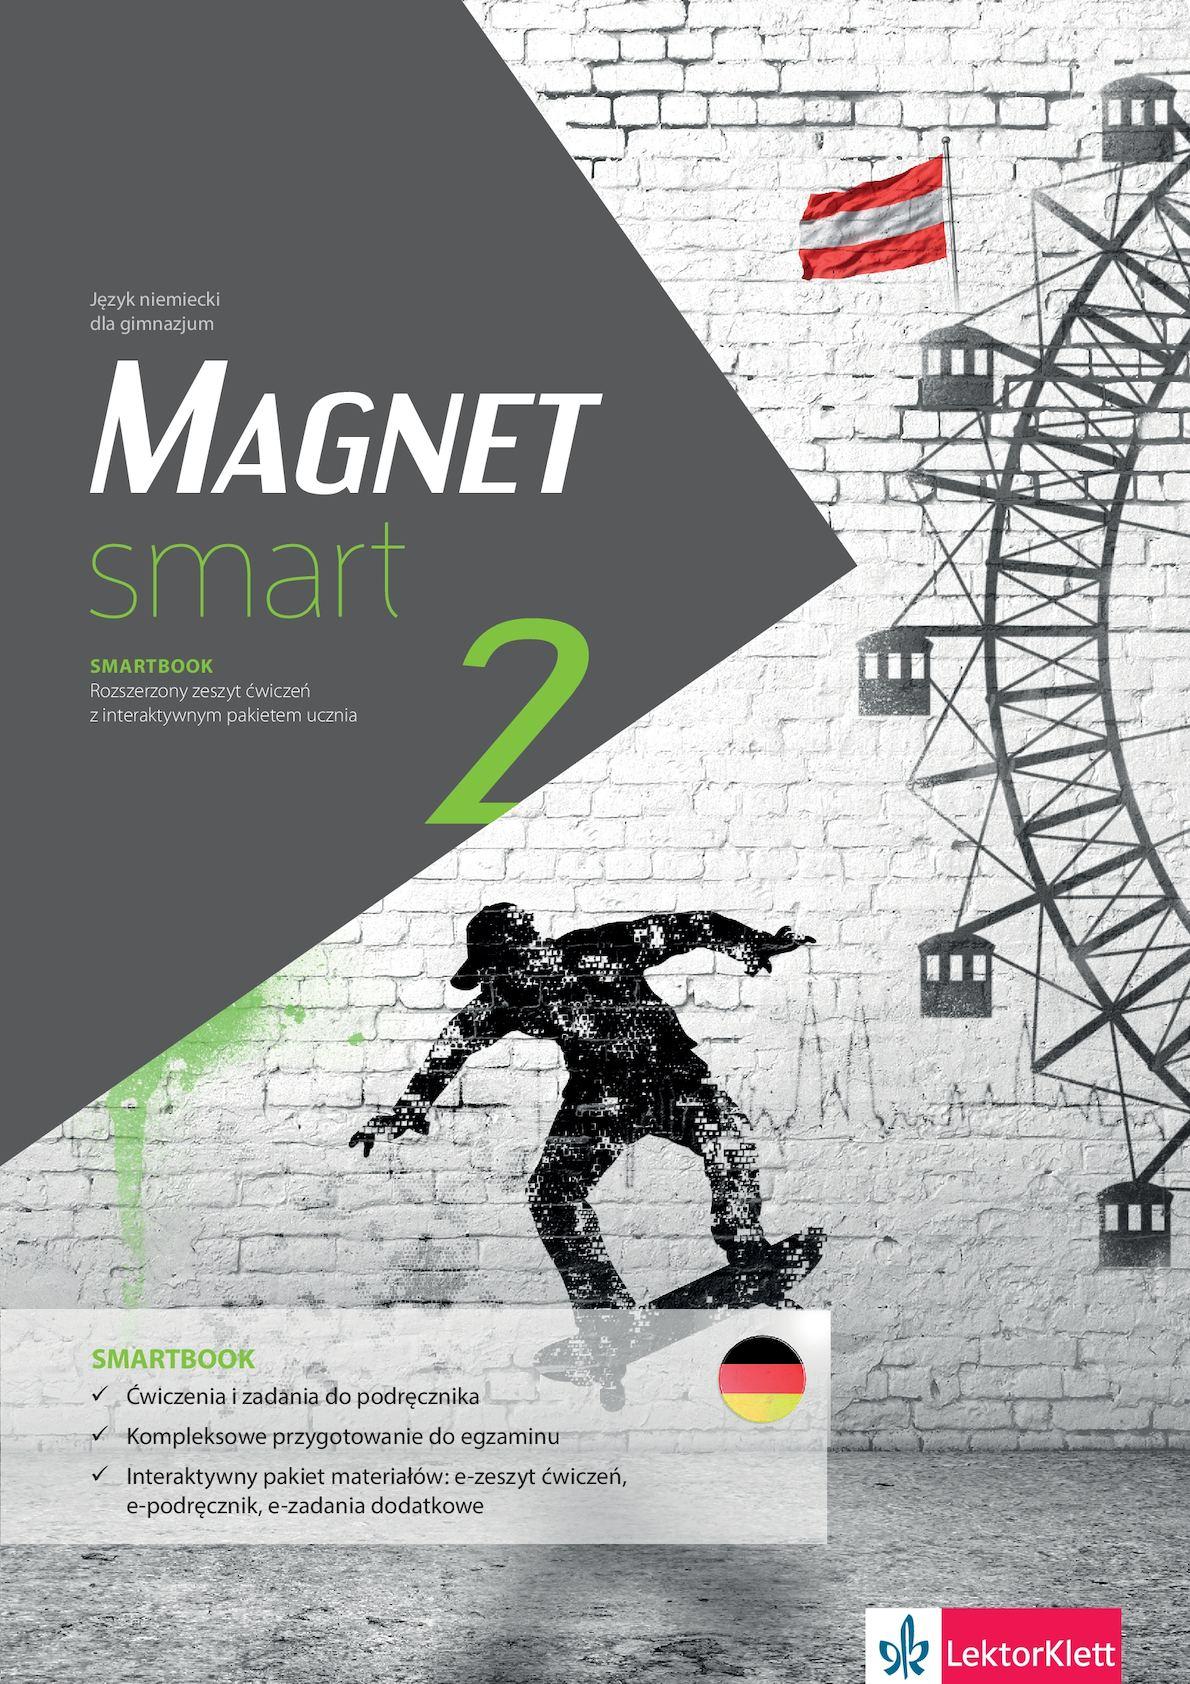 Magnet Smart 2 Smartbuch